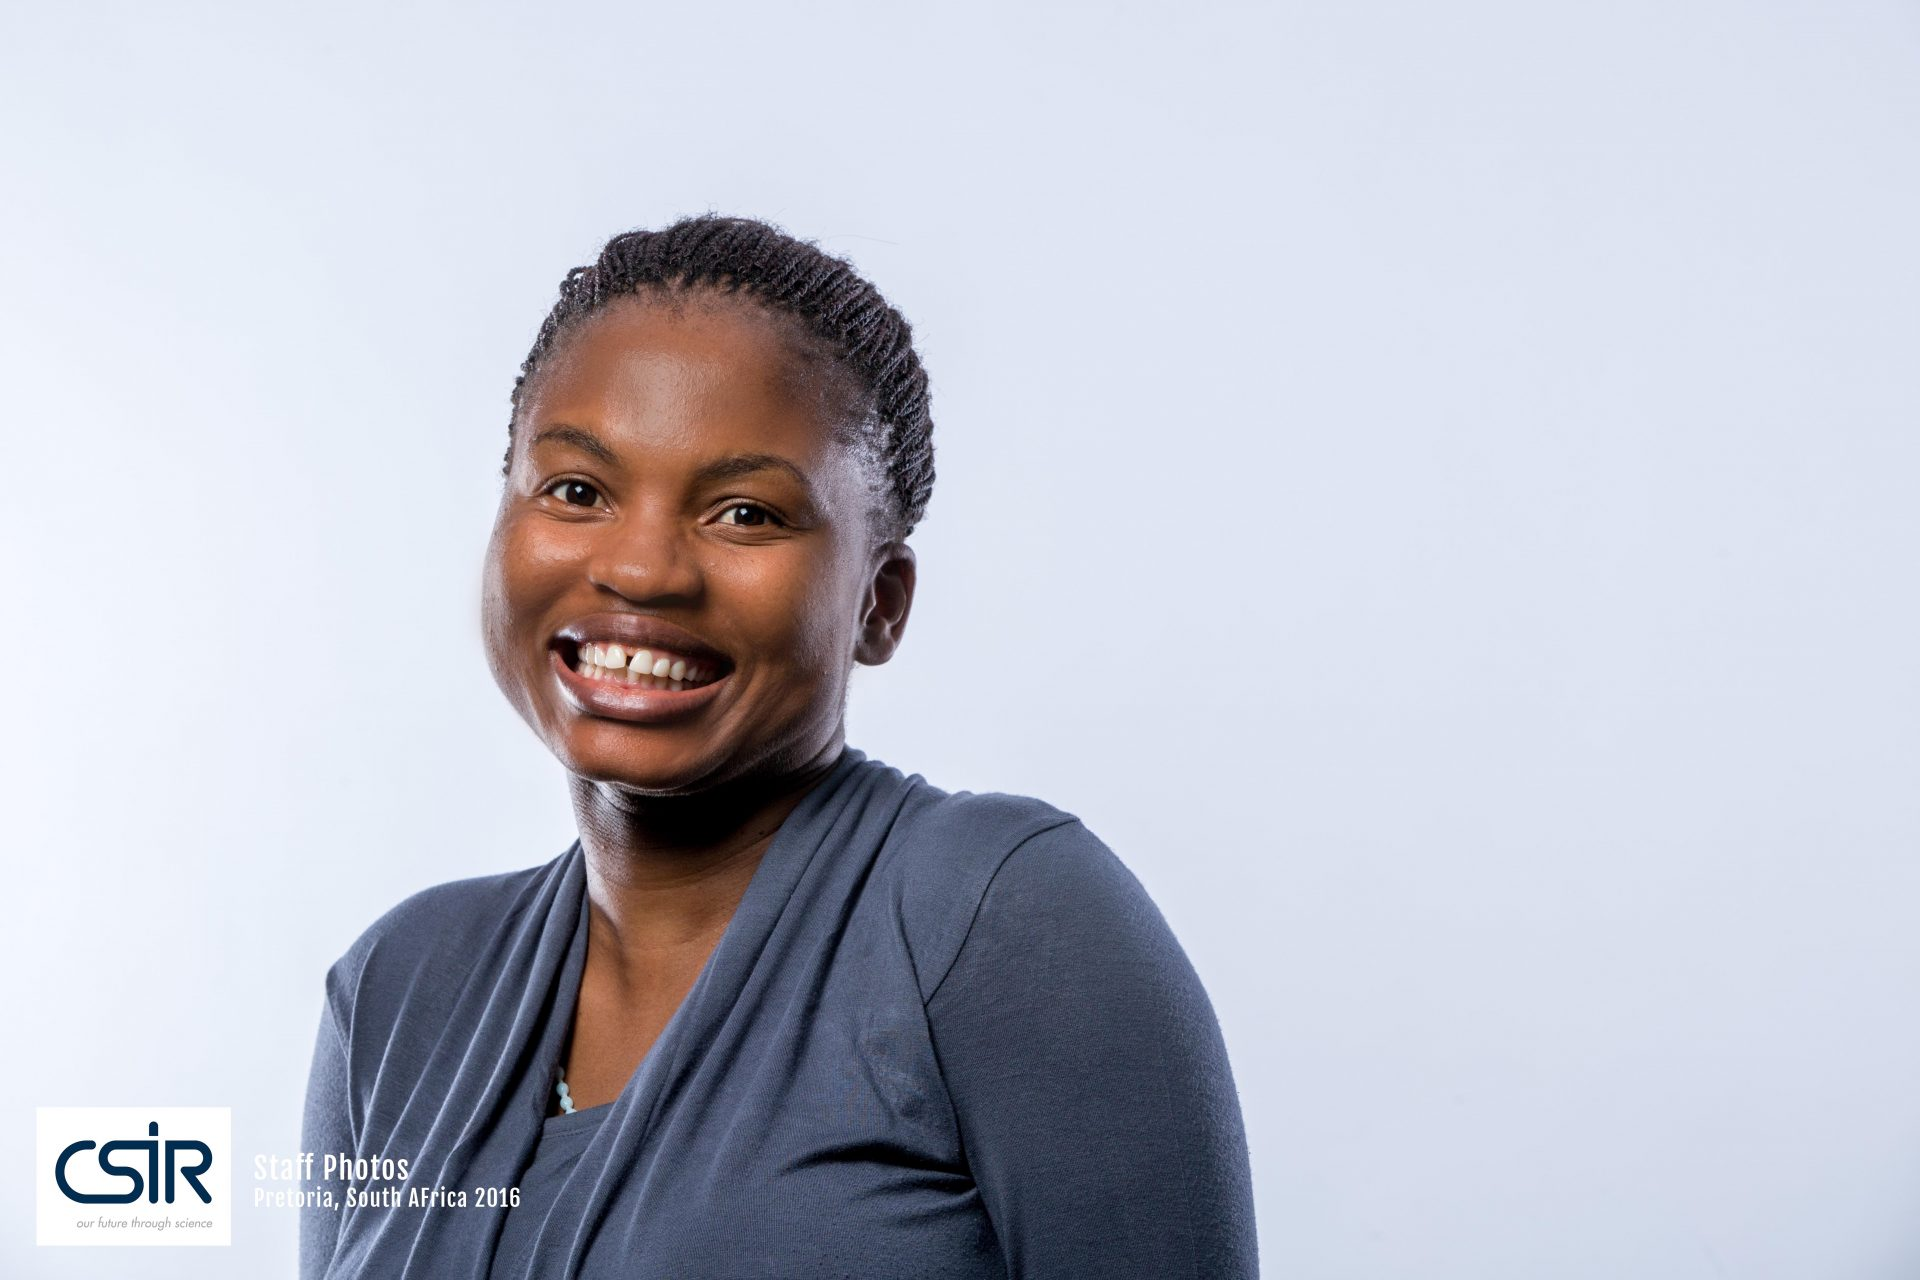 Portraits of  CSIR Staff - Black women in blue dress